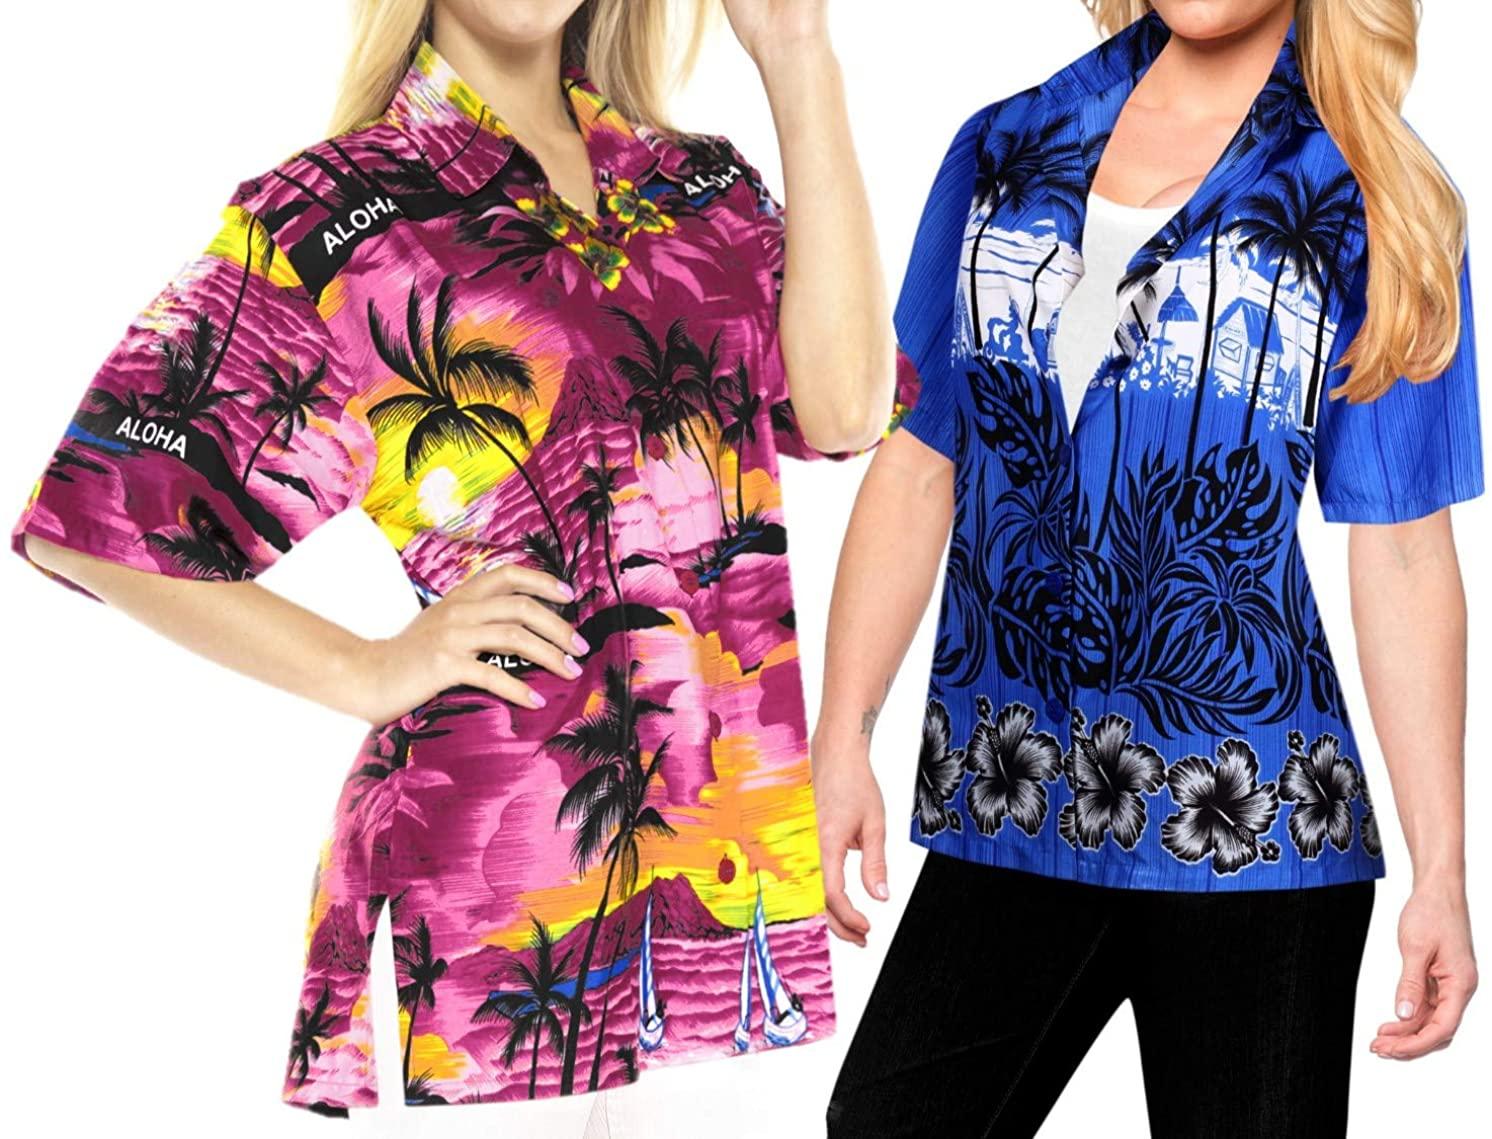 LA LEELA Women's Plus Size Casual Short Sleeve Aloha Hawaiian Shirt XL Work from Home Clothes Women Blouse Pack of 2